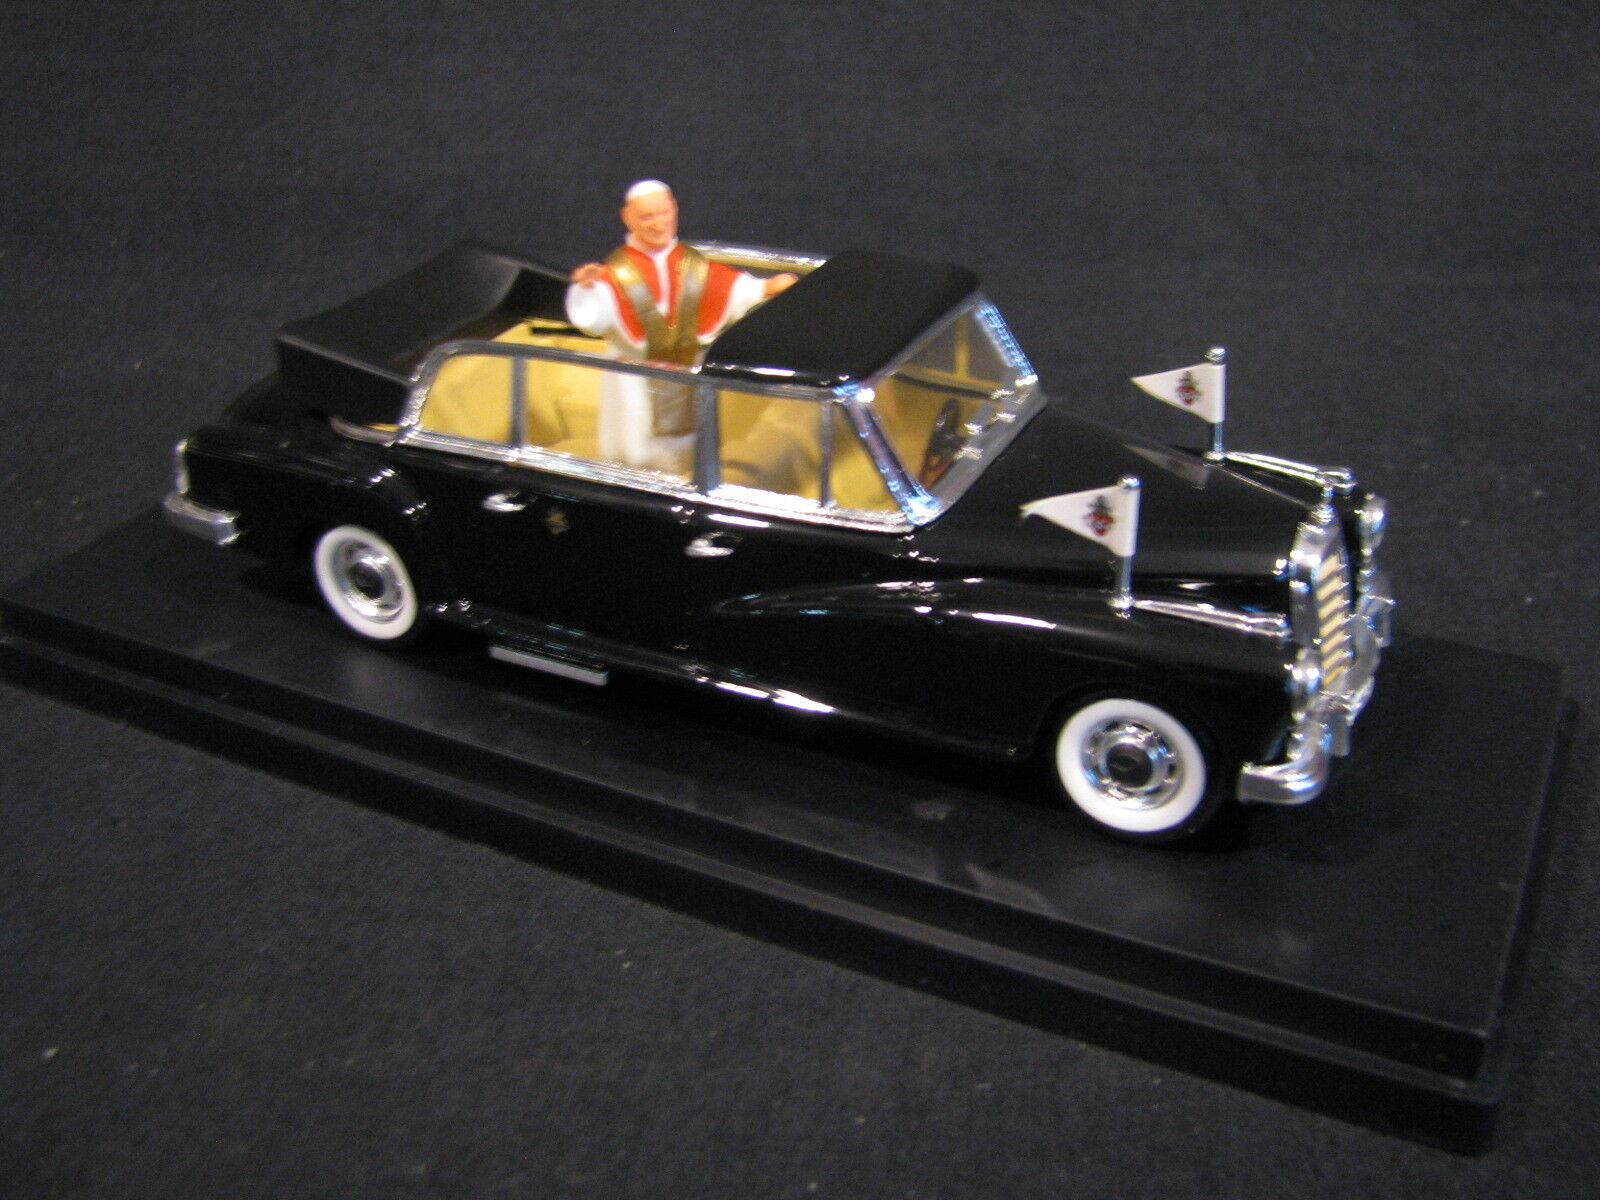 Rio Mercedes-Benz 300D Limousine 1 43 Pope Giovanni XXlll (JvM)